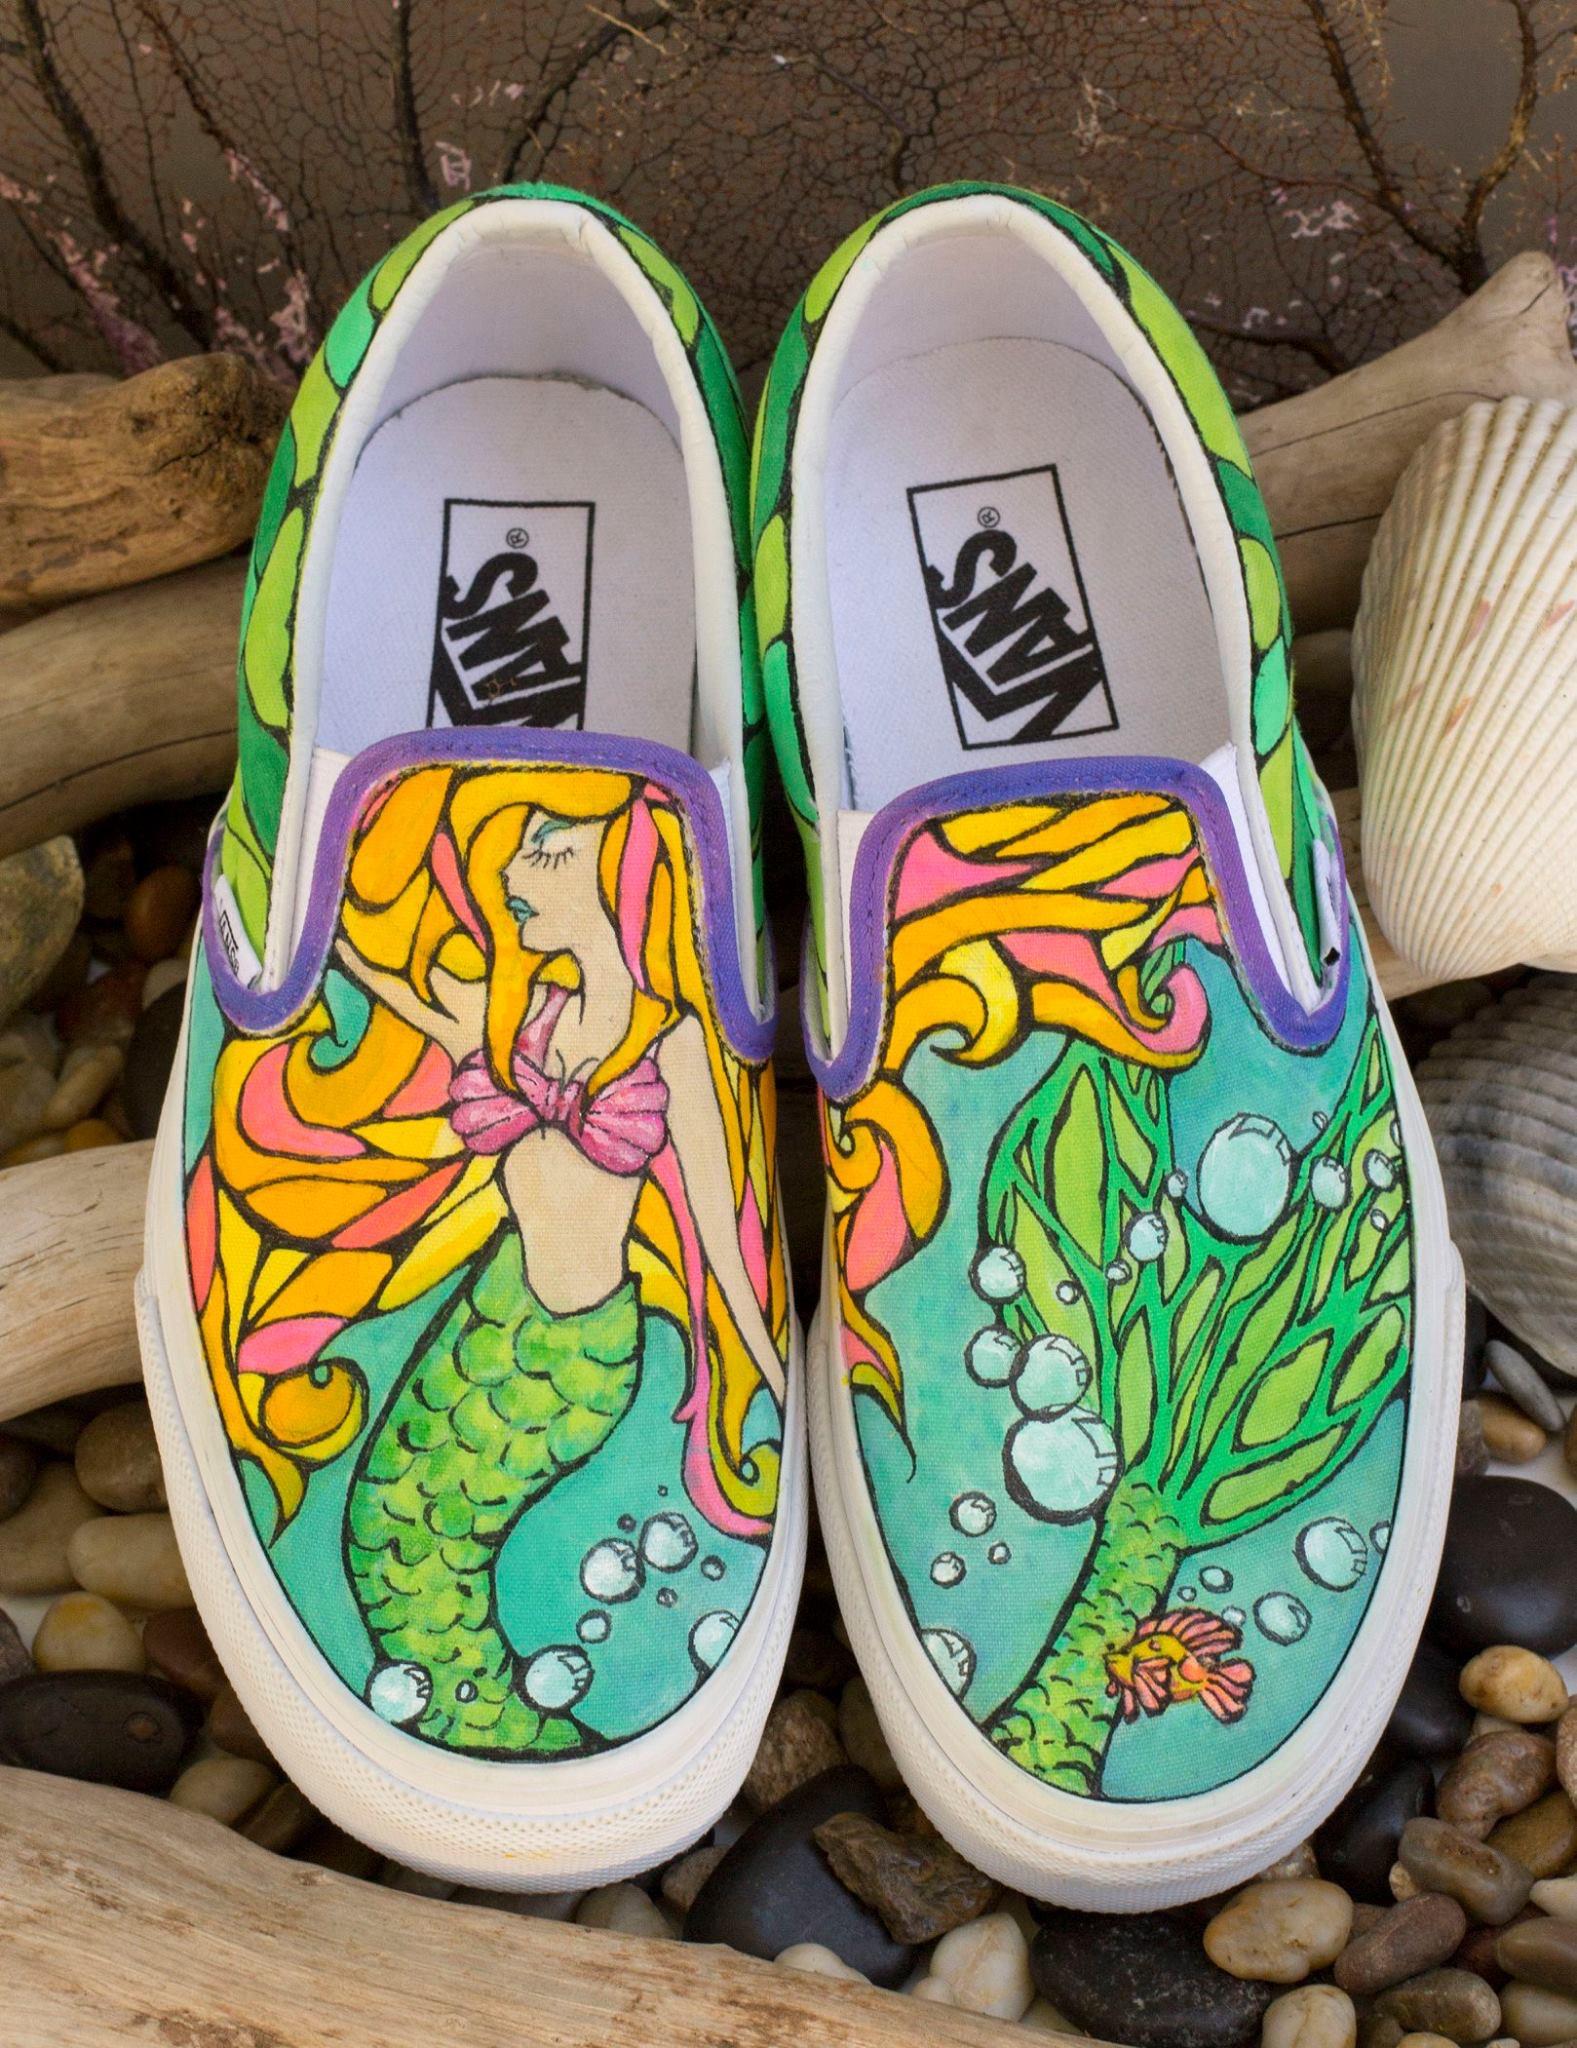 26ed3a3ac6125 Custom Hand-Painted Shoes